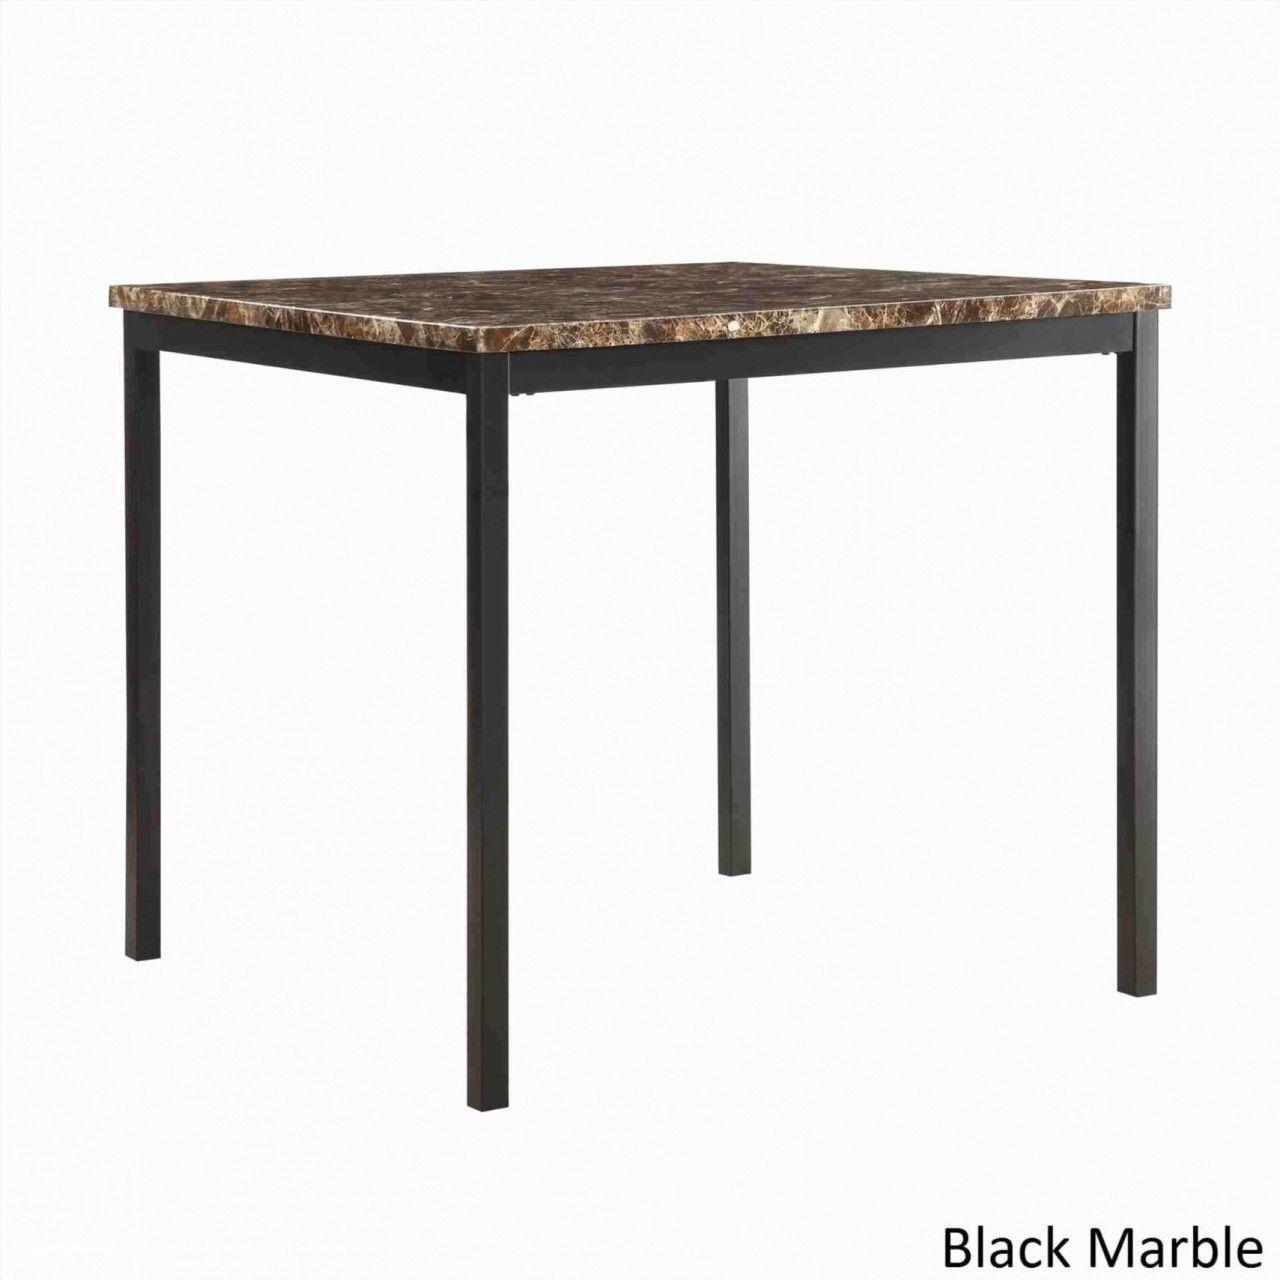 70 Elegant Black Marble Coffee Table 2018 Black Marble Coffee Table Counter Height Dining Table Dining Table Marble